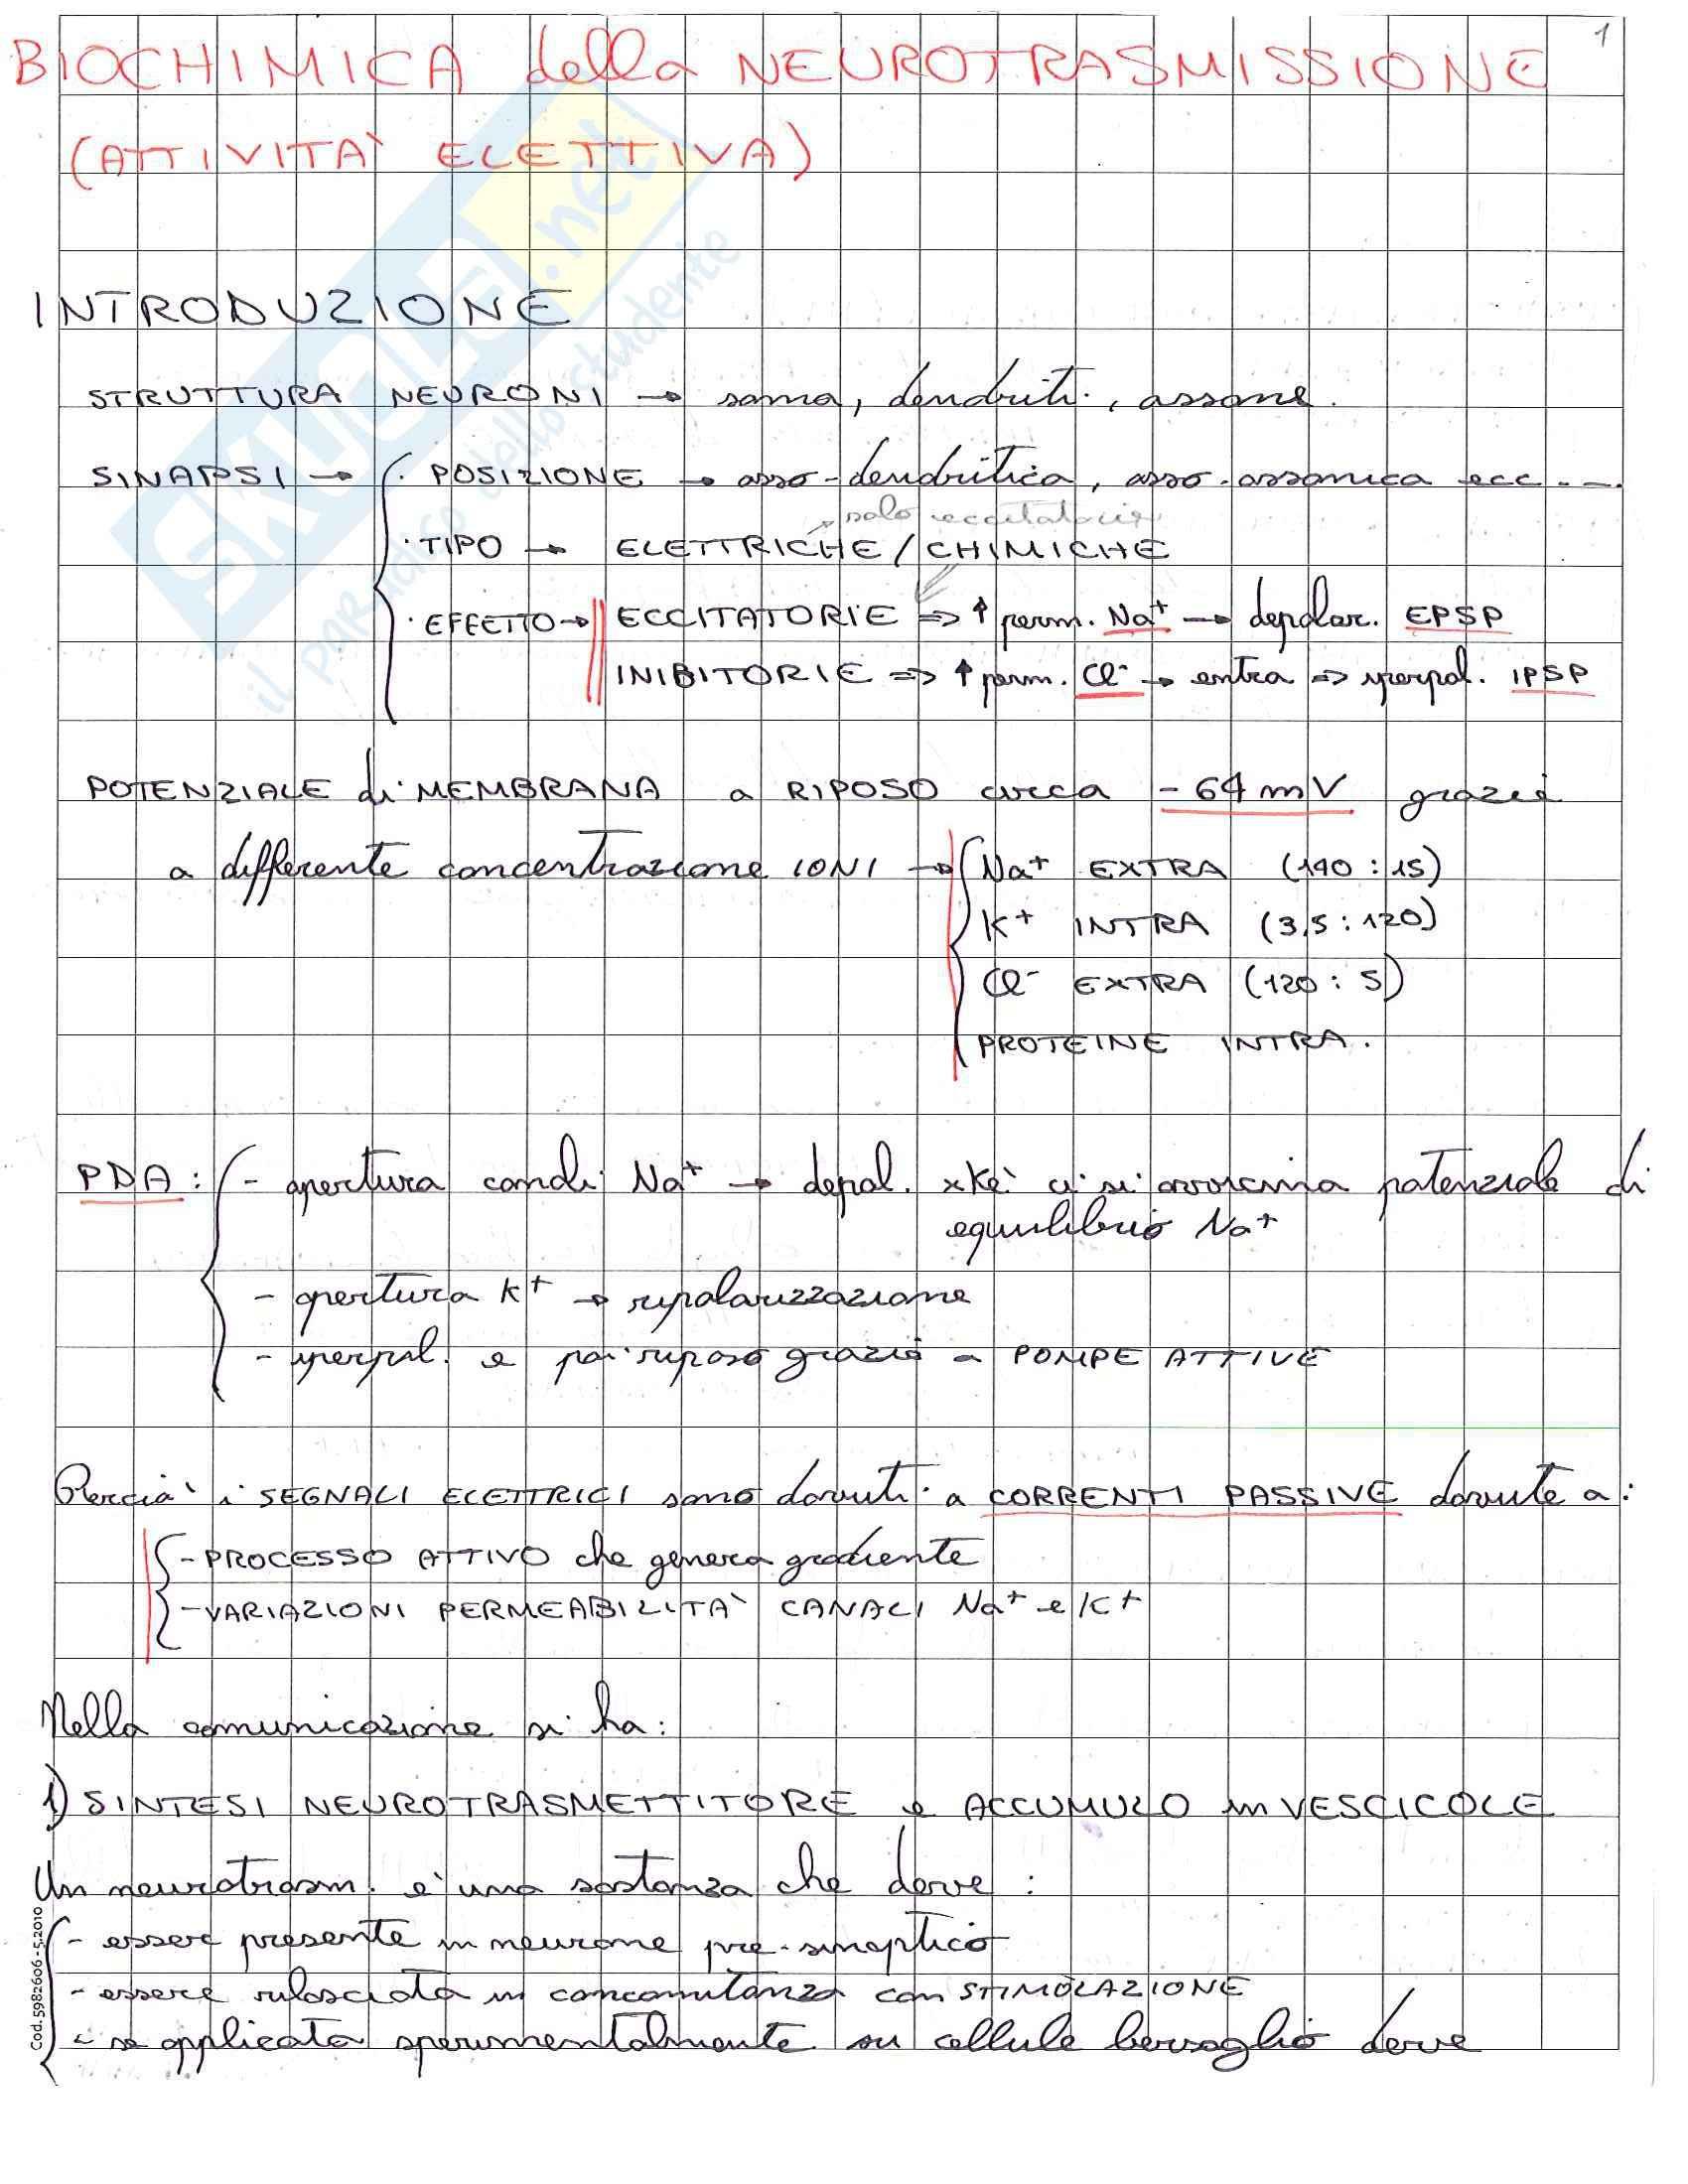 Lezioni, Biochimica fisiologica e patologica